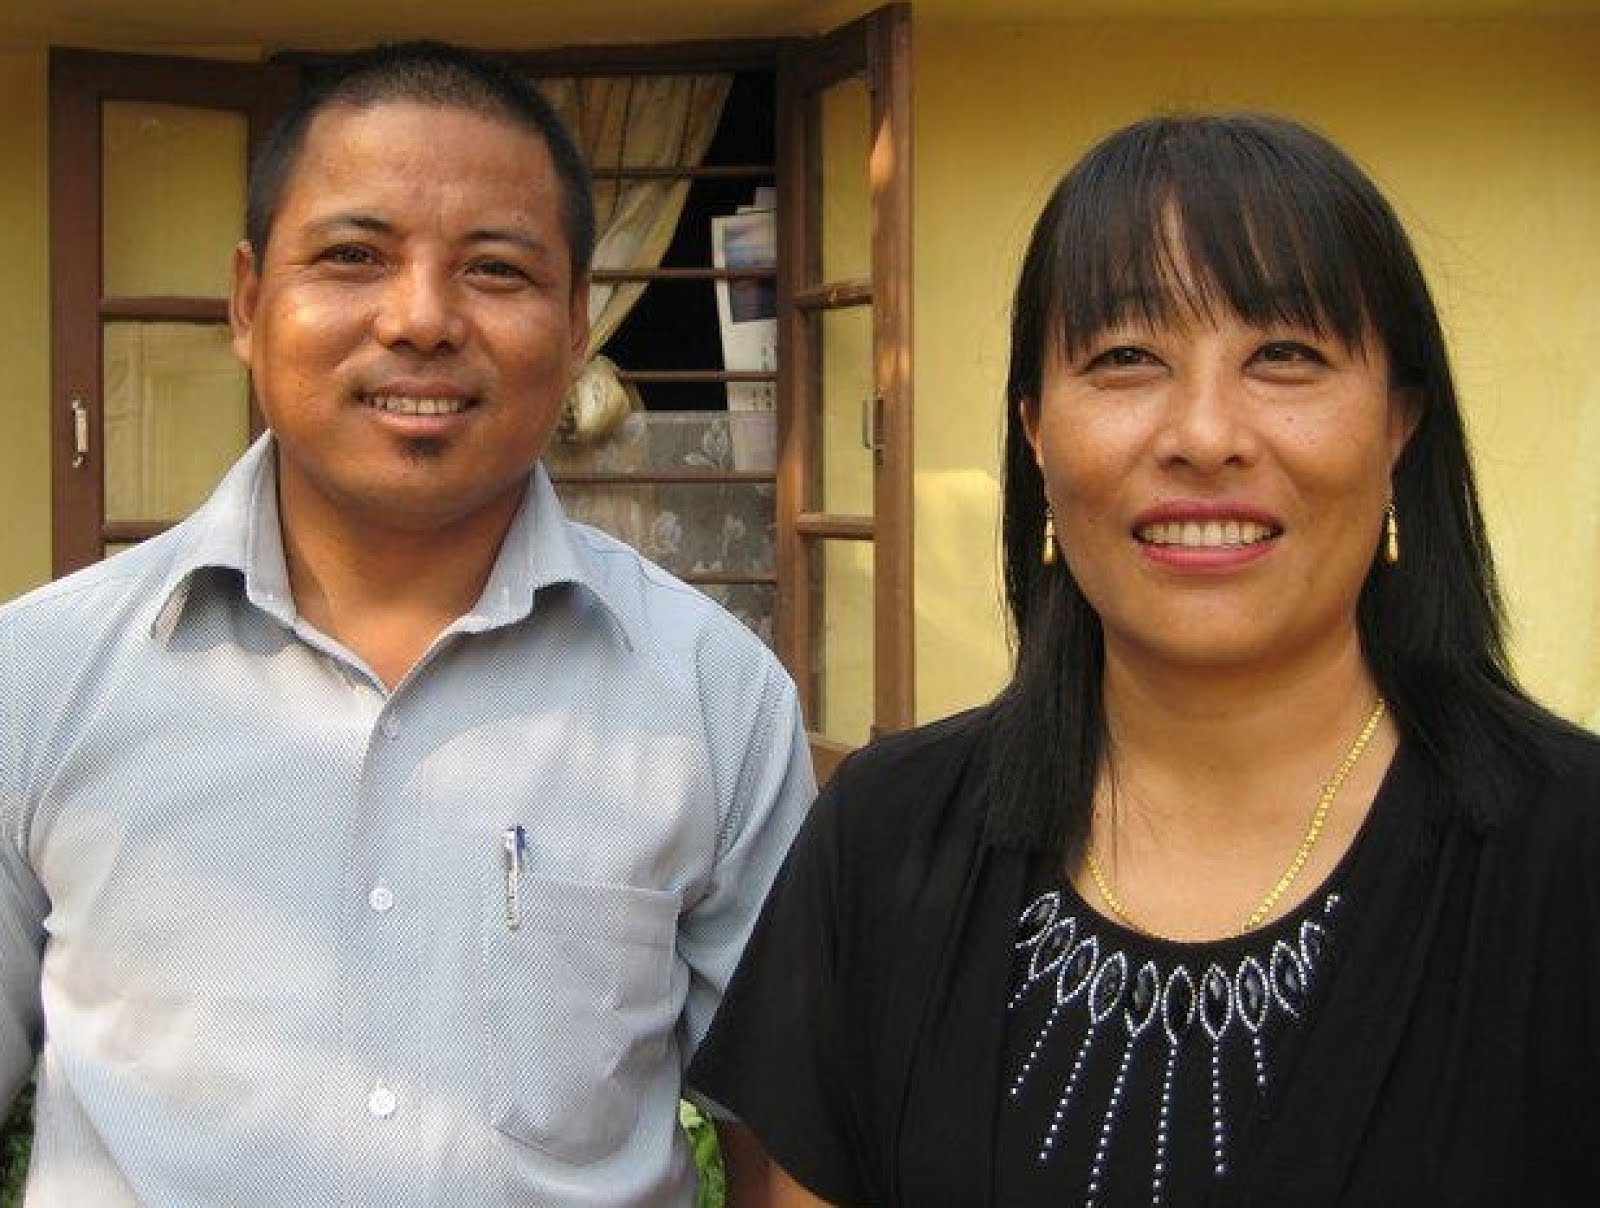 Lima & Arenla